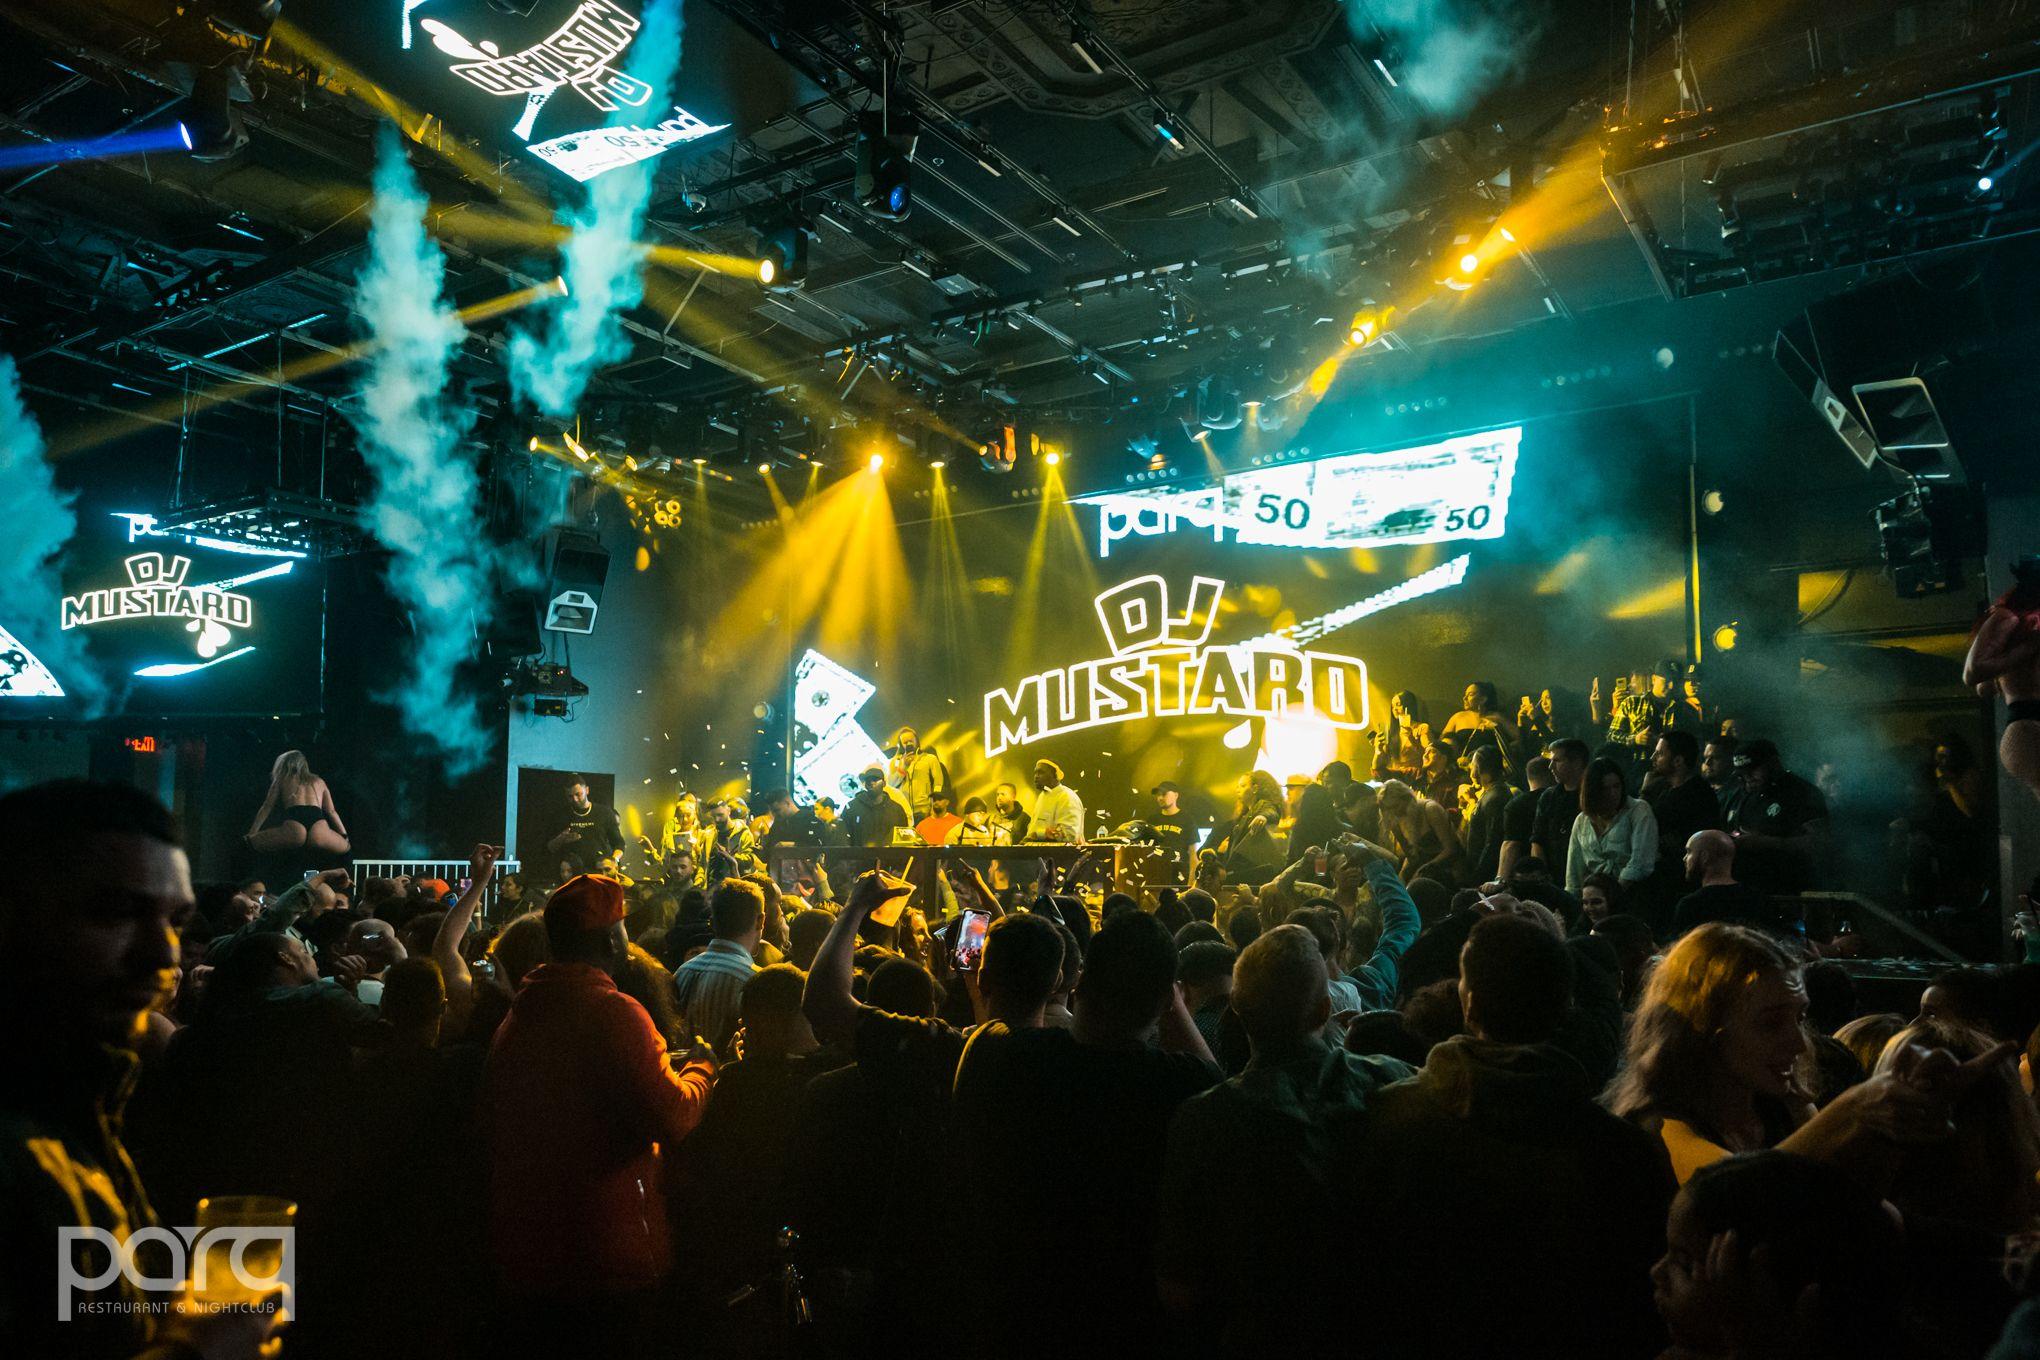 11.27.19 Parq - DJ Mustard-24.jpg